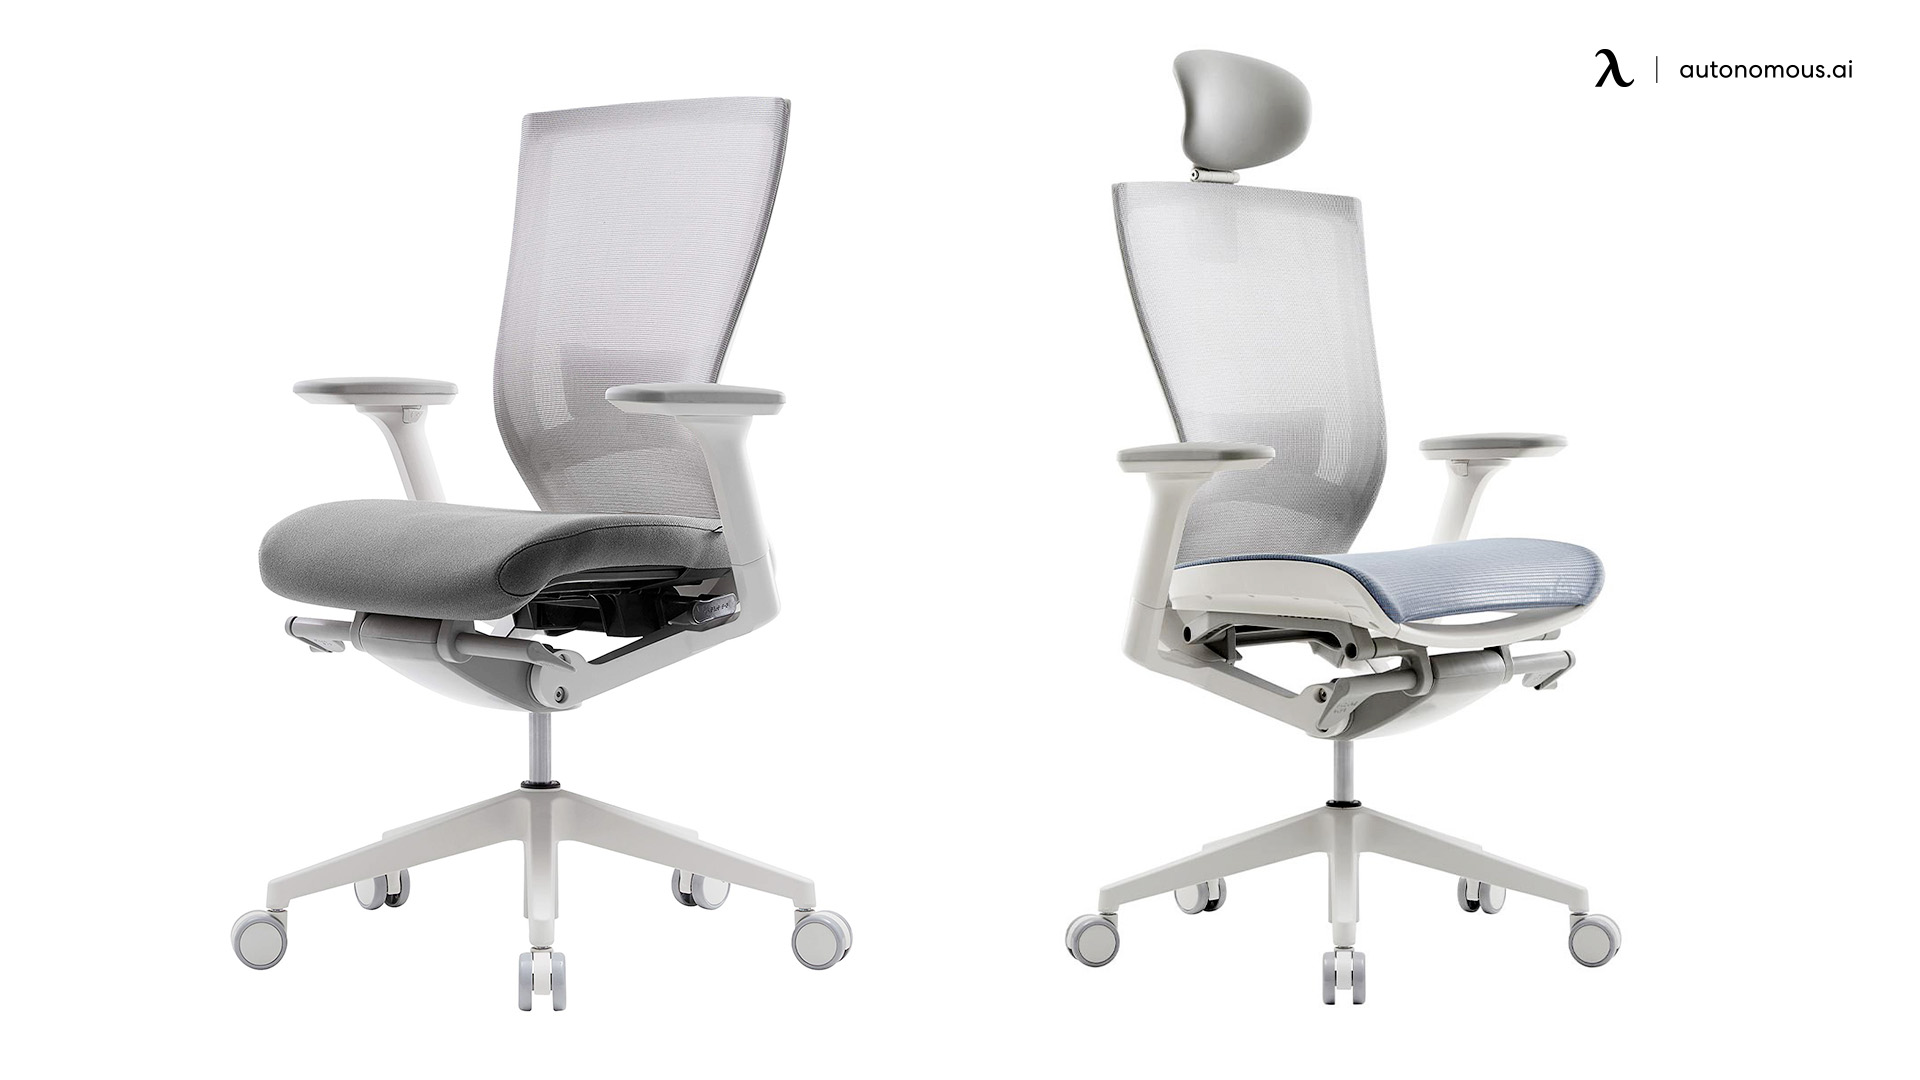 SIDIZ T50 Office Chair